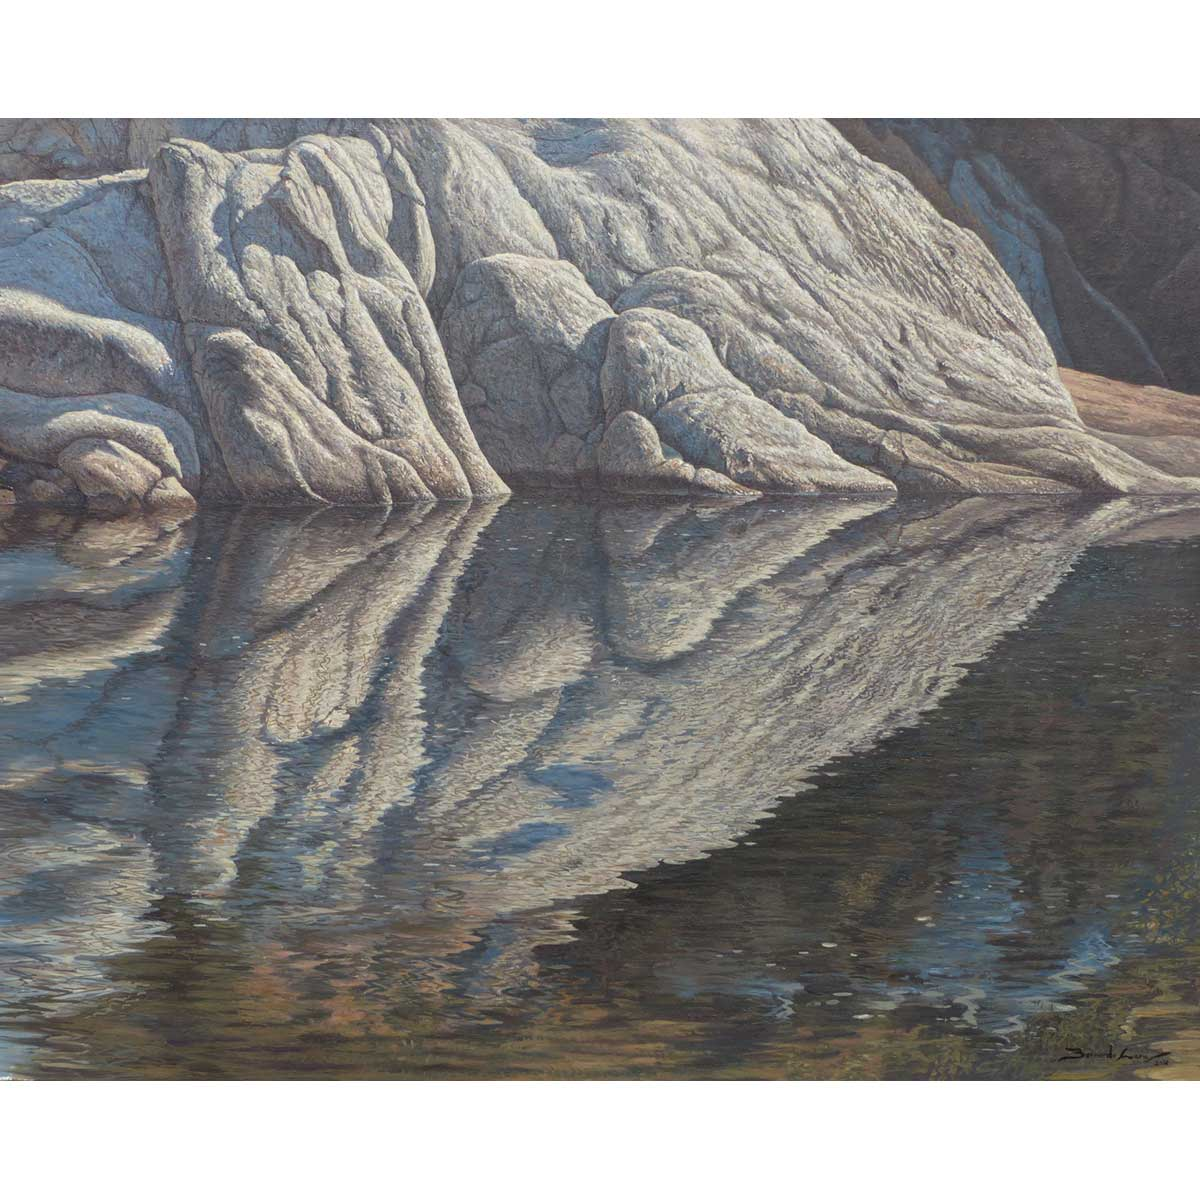 BERNARDO LARA - Simetría. Óleo sobre lino. 81x65cm.